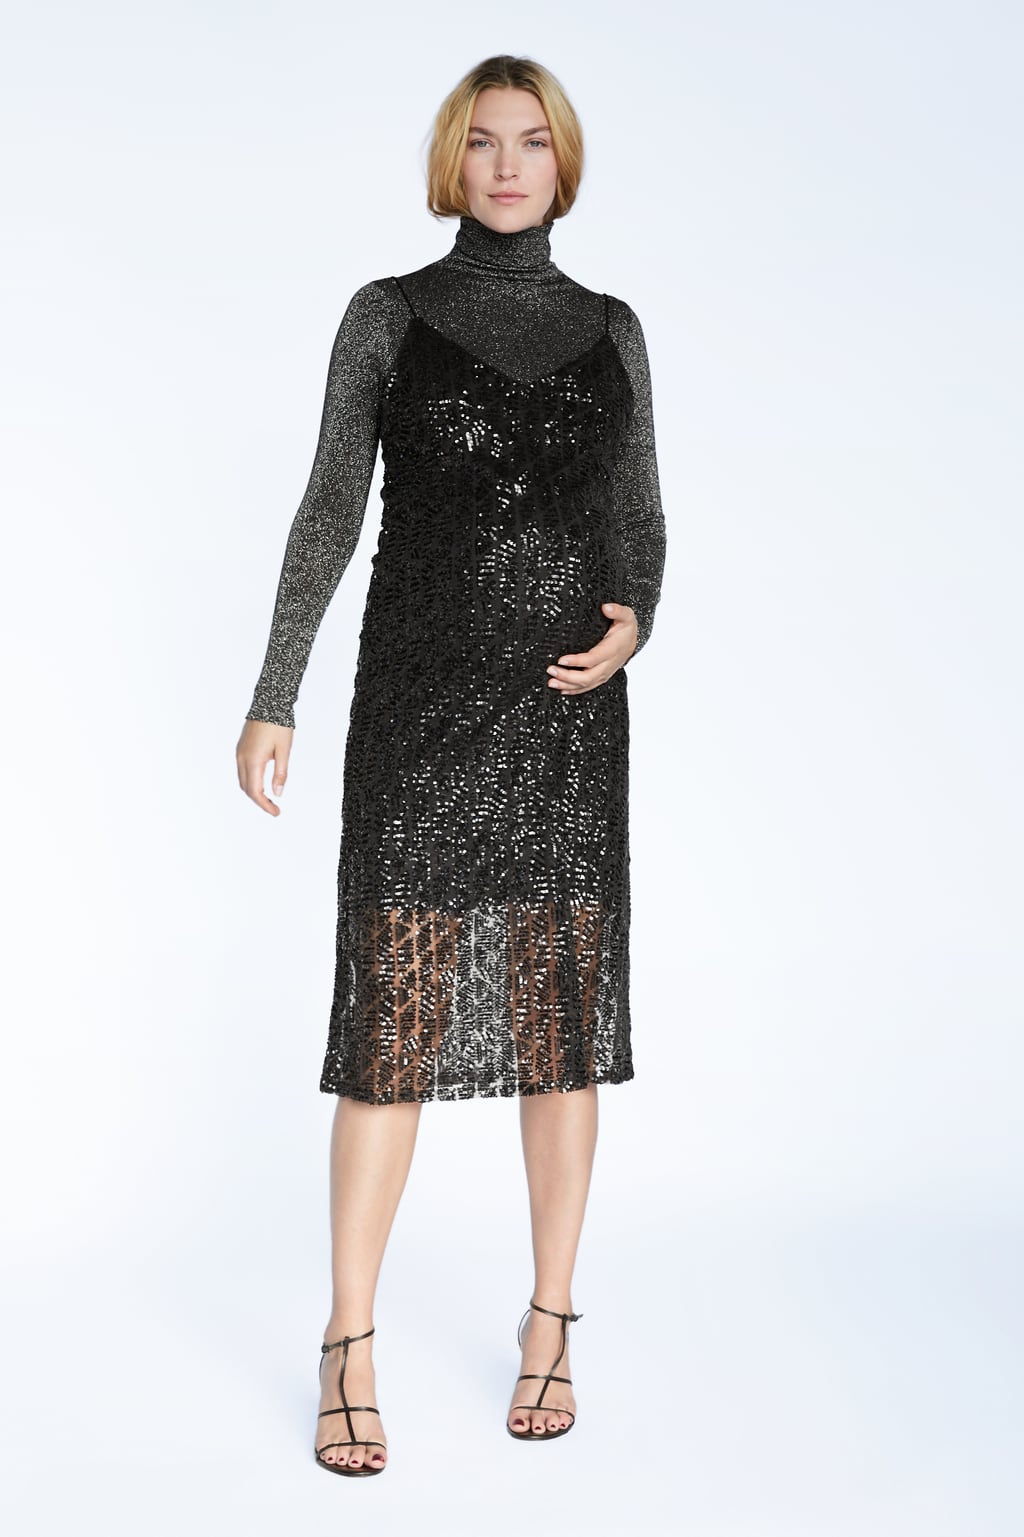 Zara 25 Party Dresses